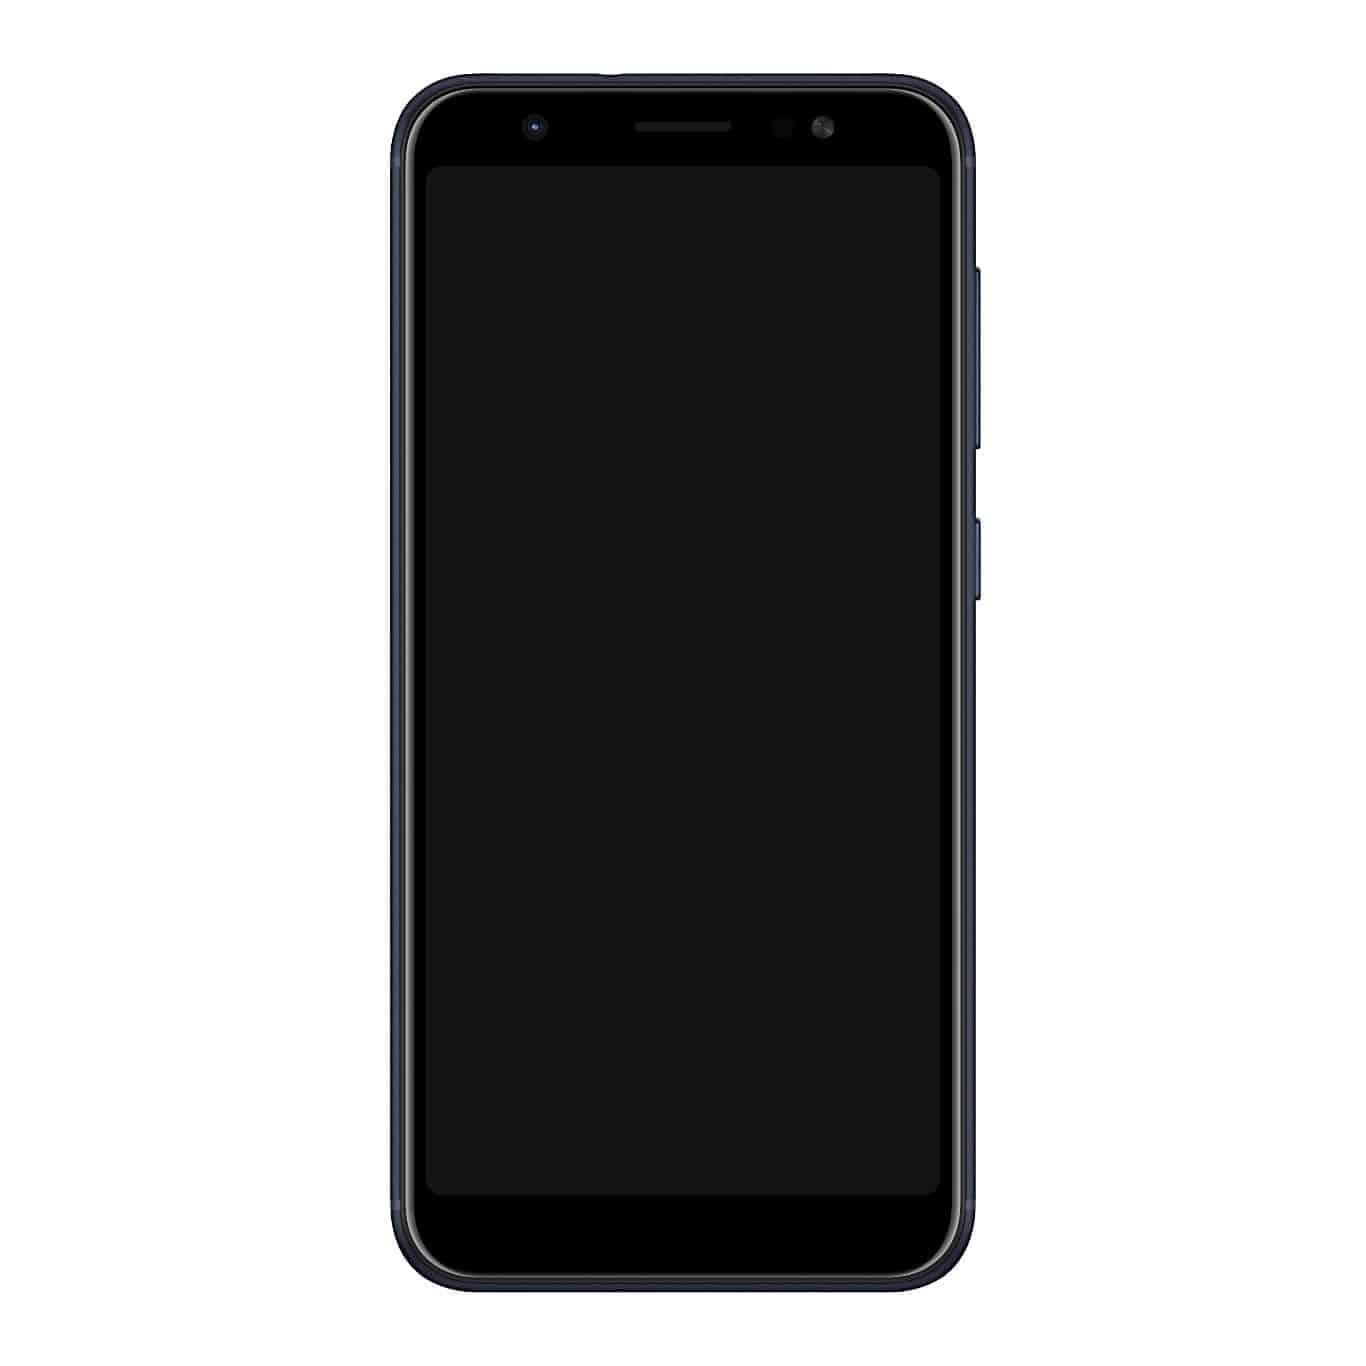 ASUS ZenFone Max M1 official image 1